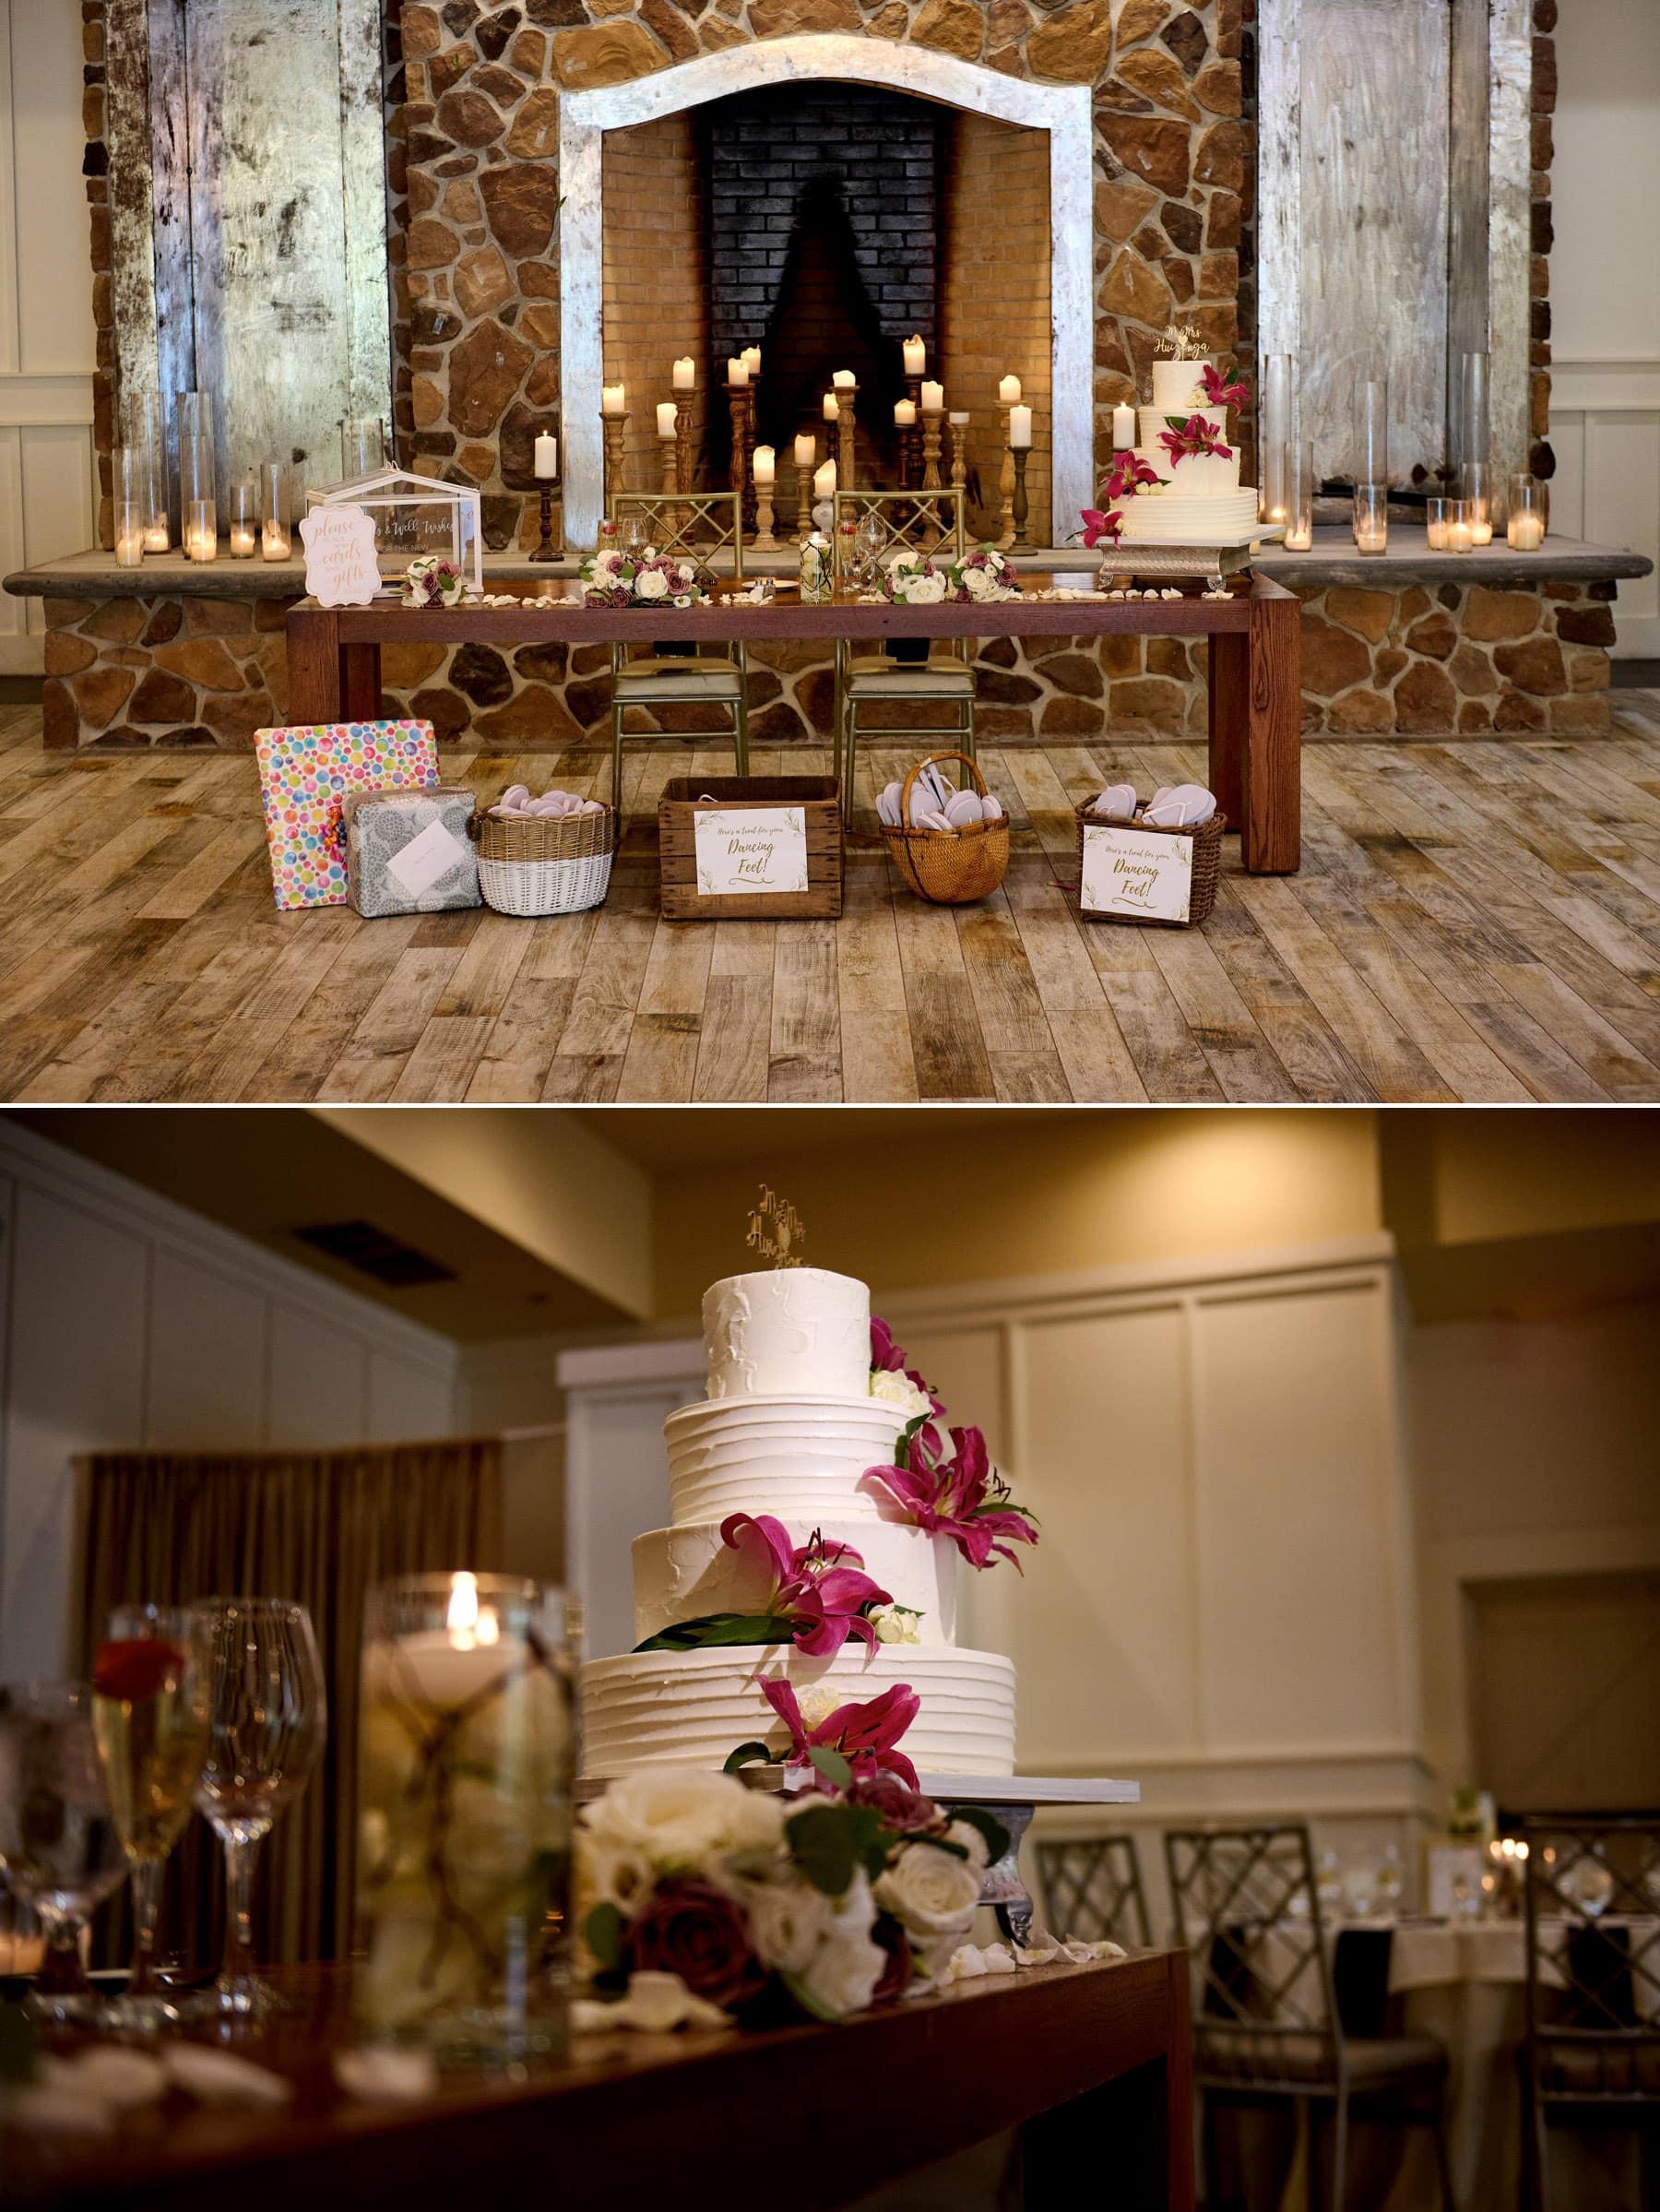 The Farmhouse wedding ballroom details